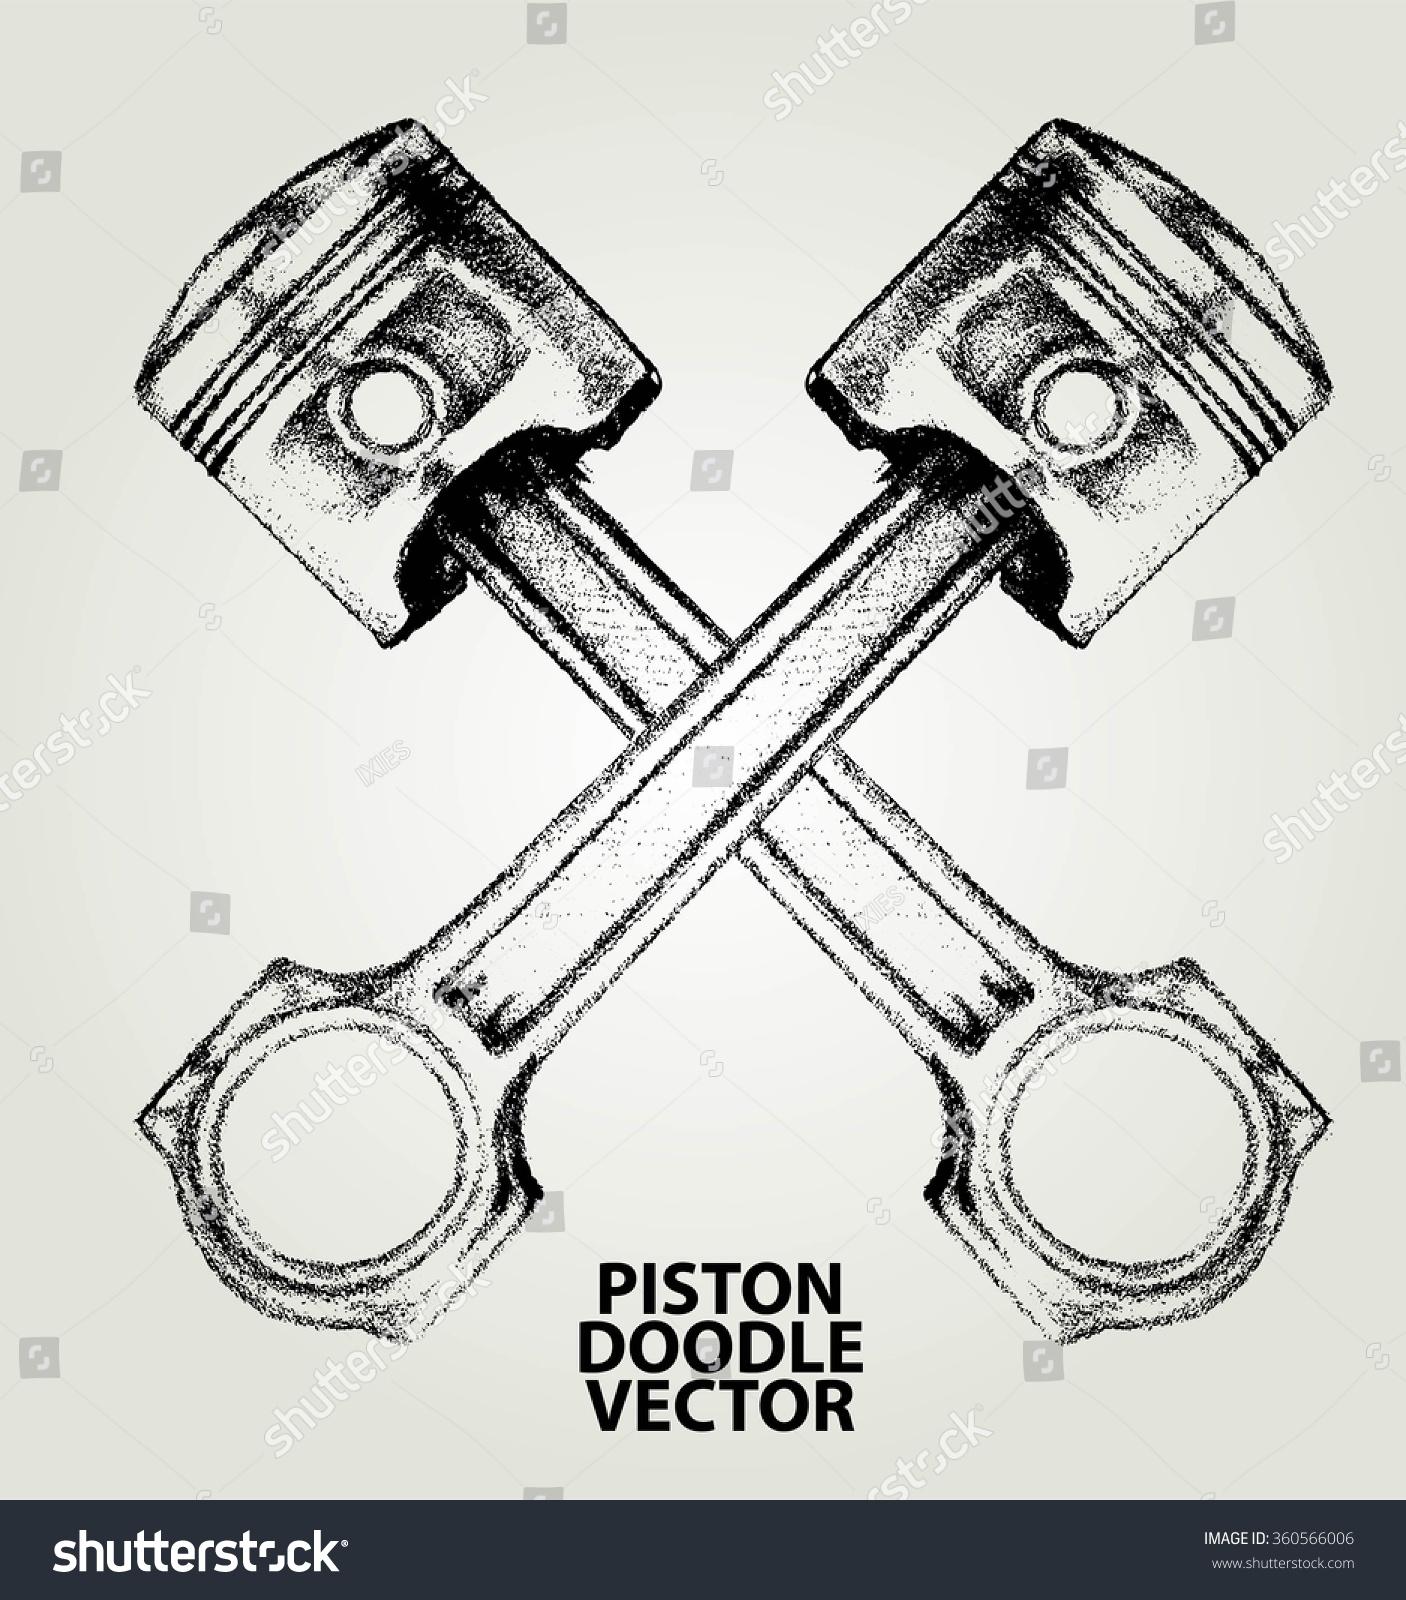 ... Engine pistons tattoo design stock vectors & vector clip art